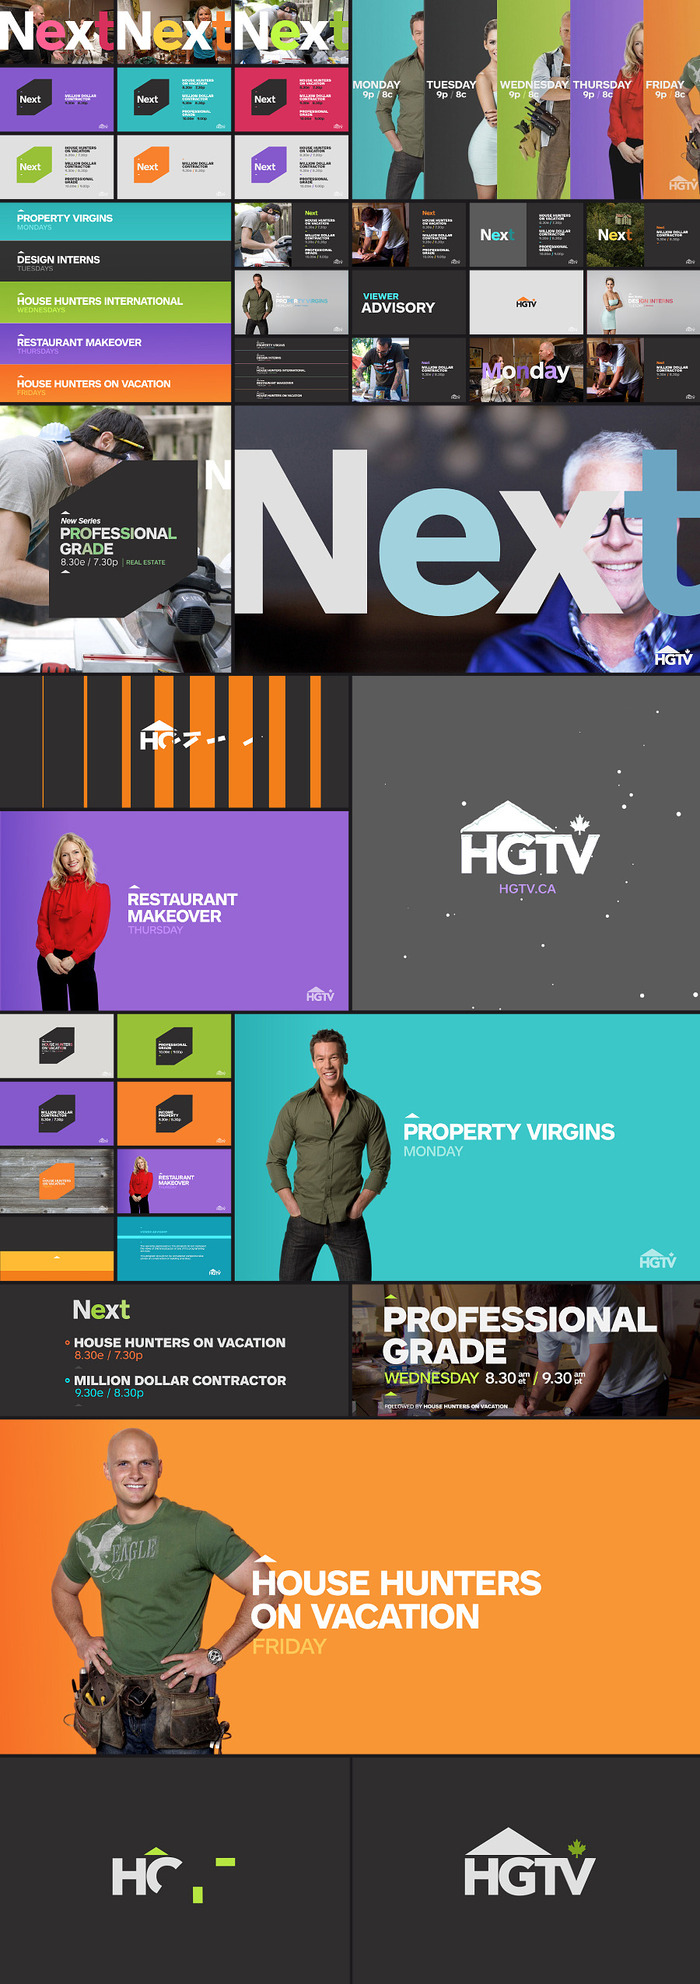 HGTV_process_ForWebsite_900.jpg